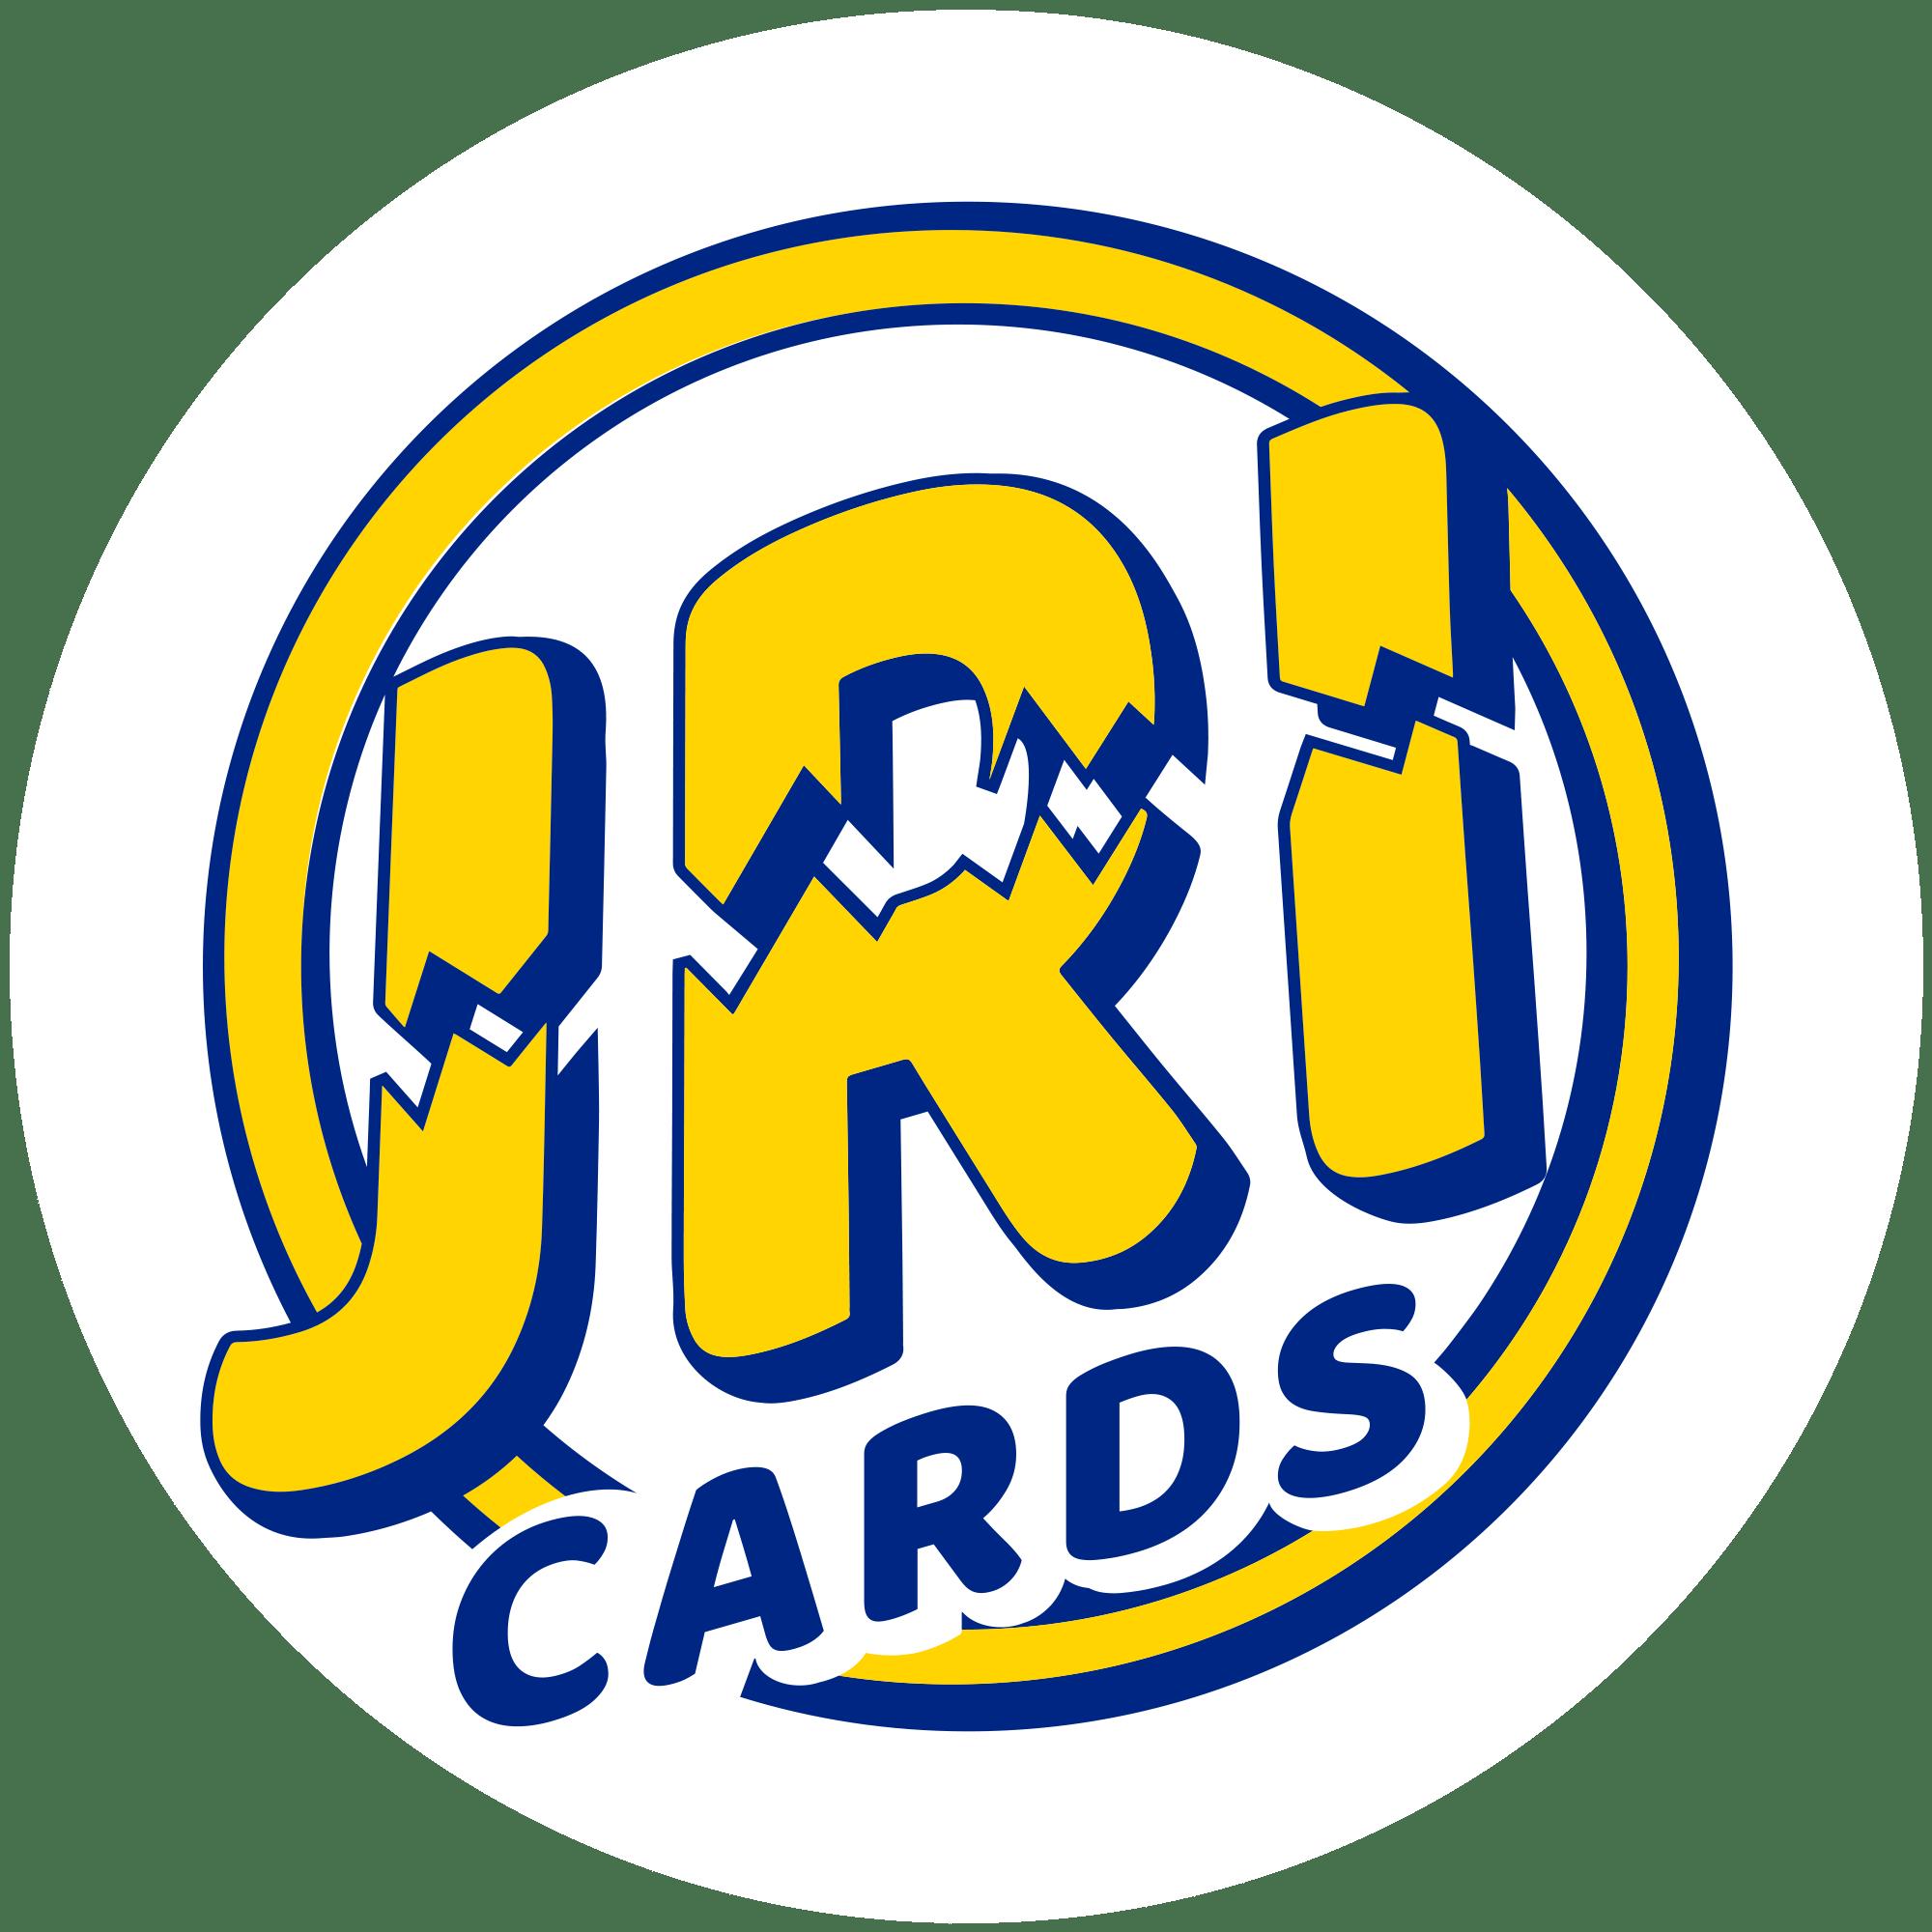 JRI EVENT|2003 UPPER DECK TOP PROSPECTS BASKETBALL BOX (50 TICKETS AVAILABLE) + BONUS JRI BLENDER (50 SPOTS)